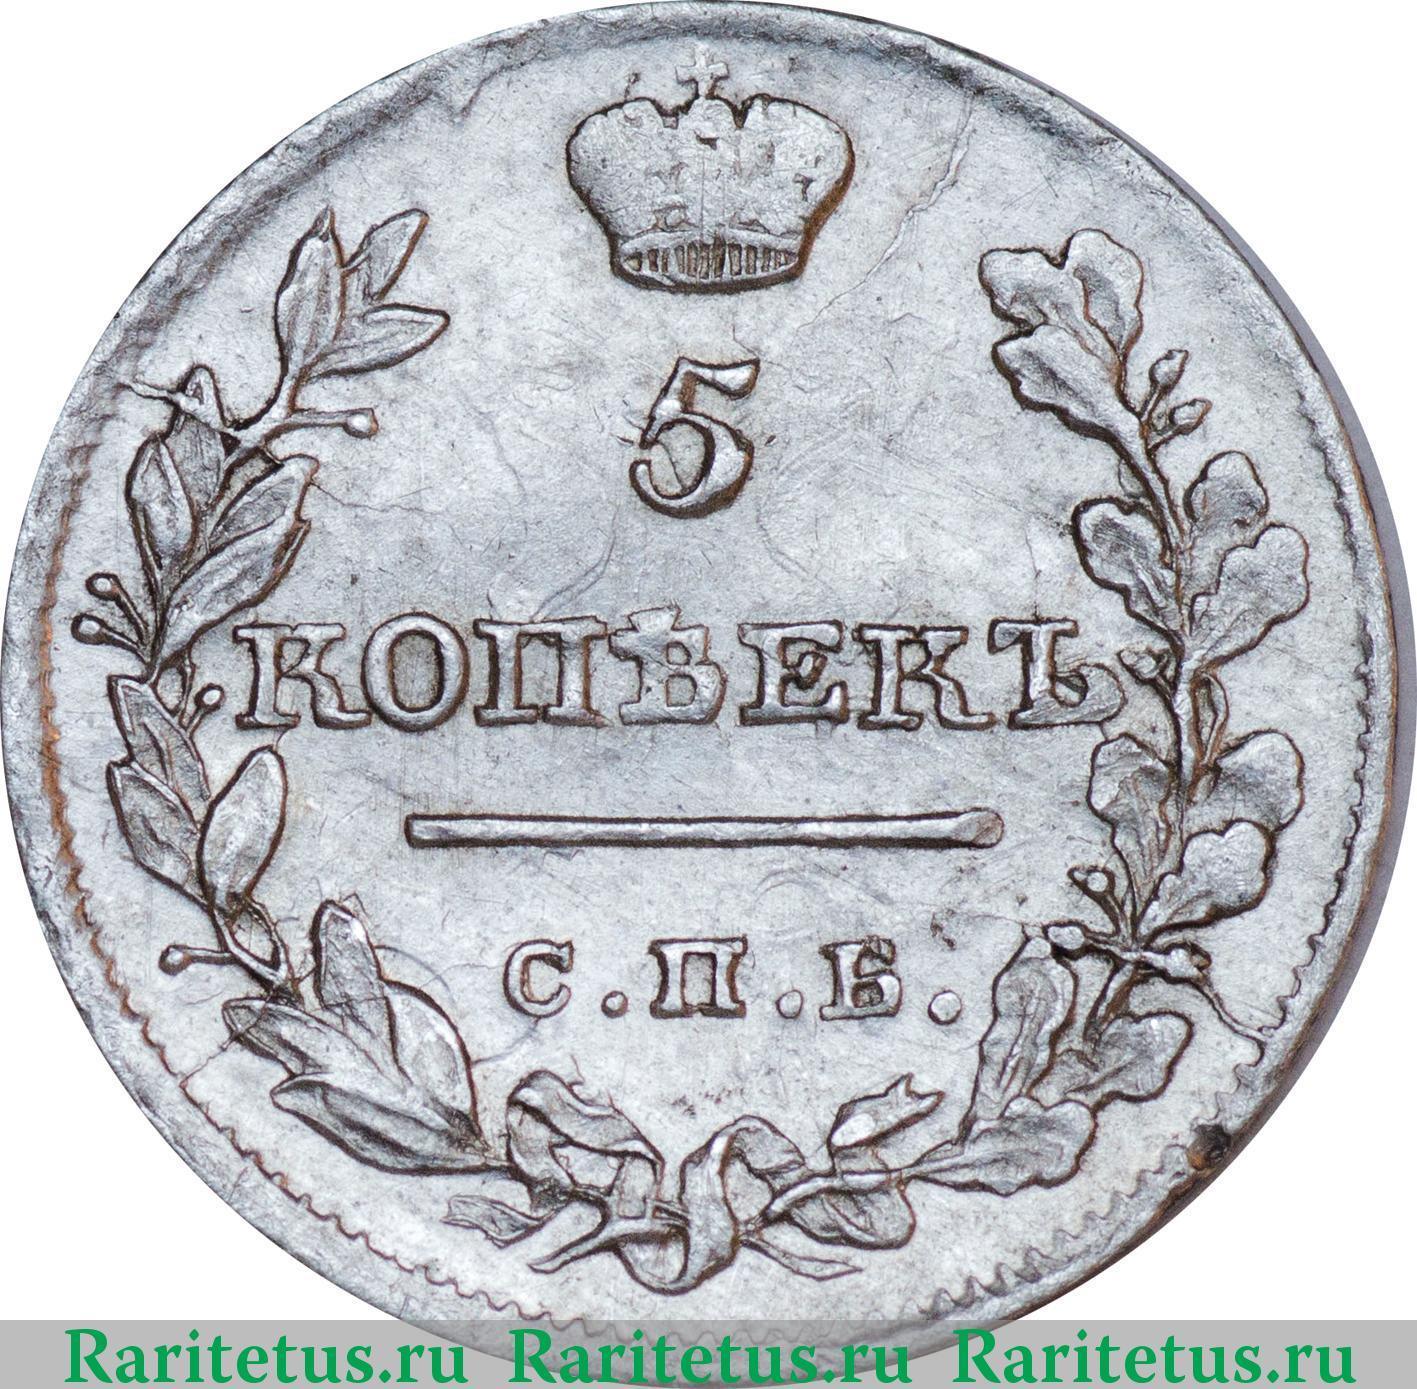 Серебряная монета 5 копеек 7 5 рублей